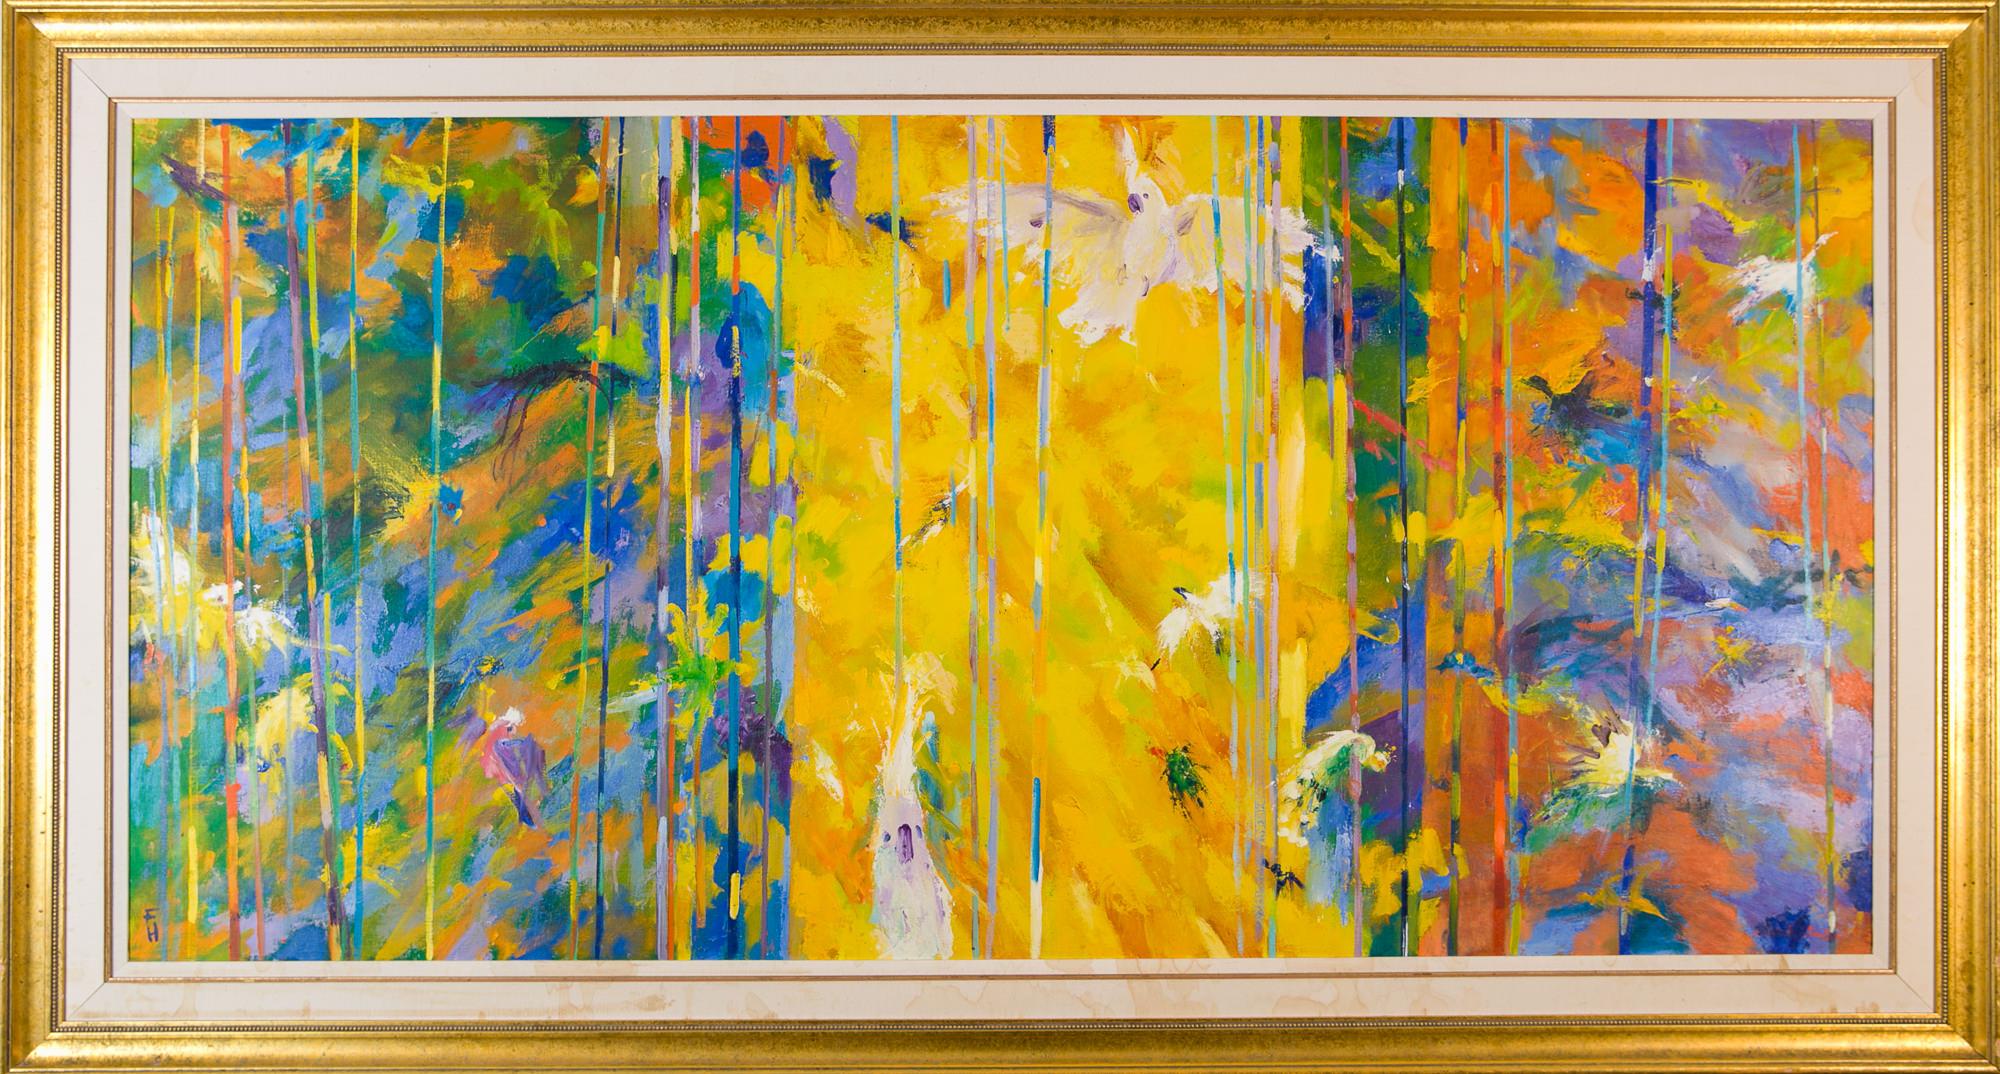 'Frank Hodgkinson (1919-2001) Seasons V 1993, Oil on Linen Board'